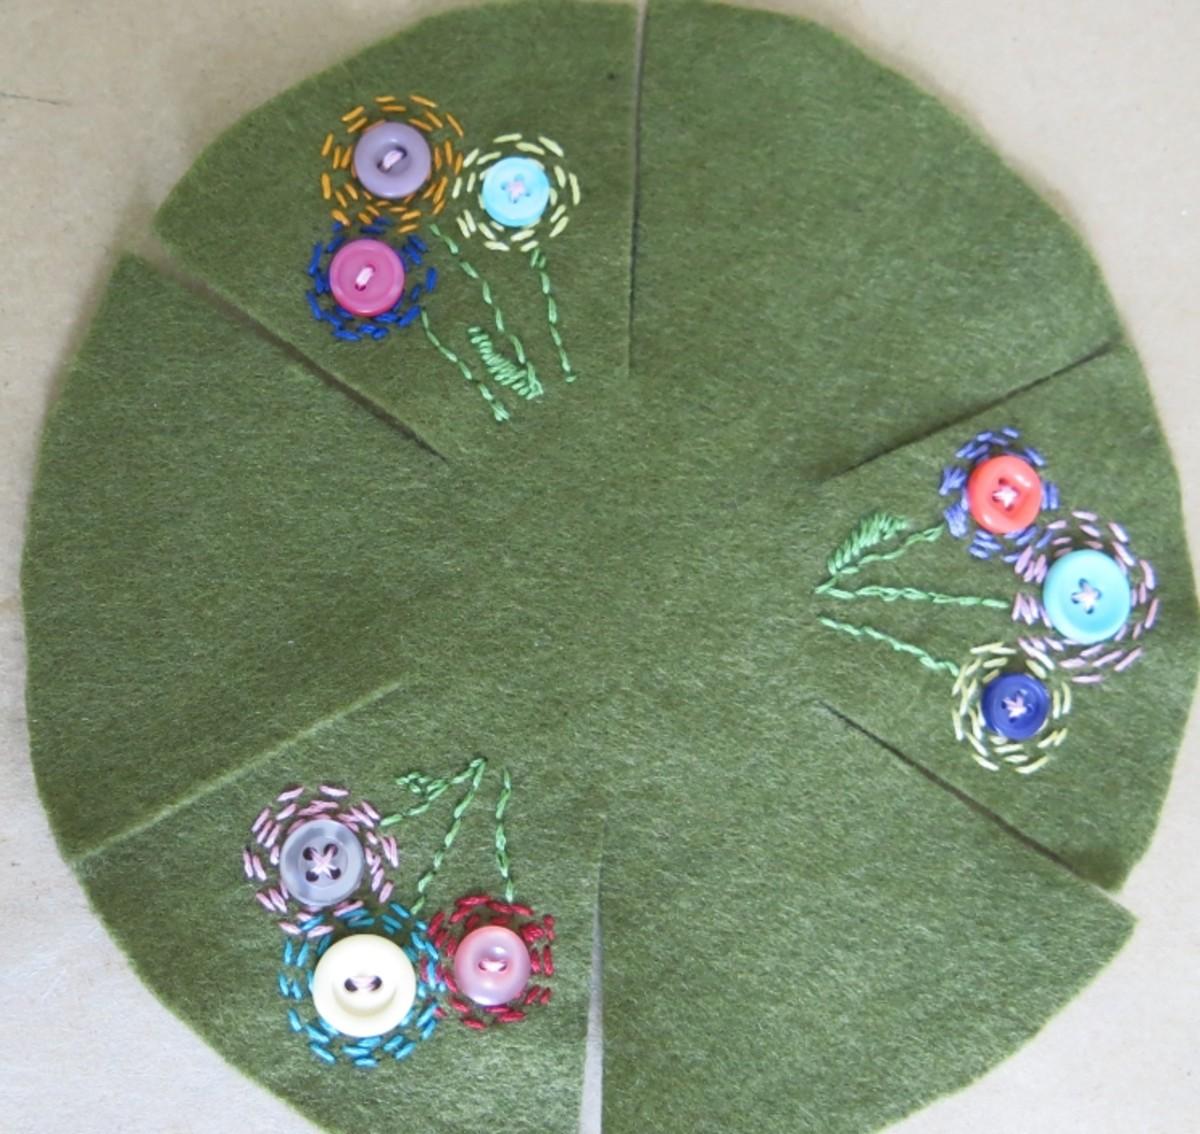 Decorating your pincushion